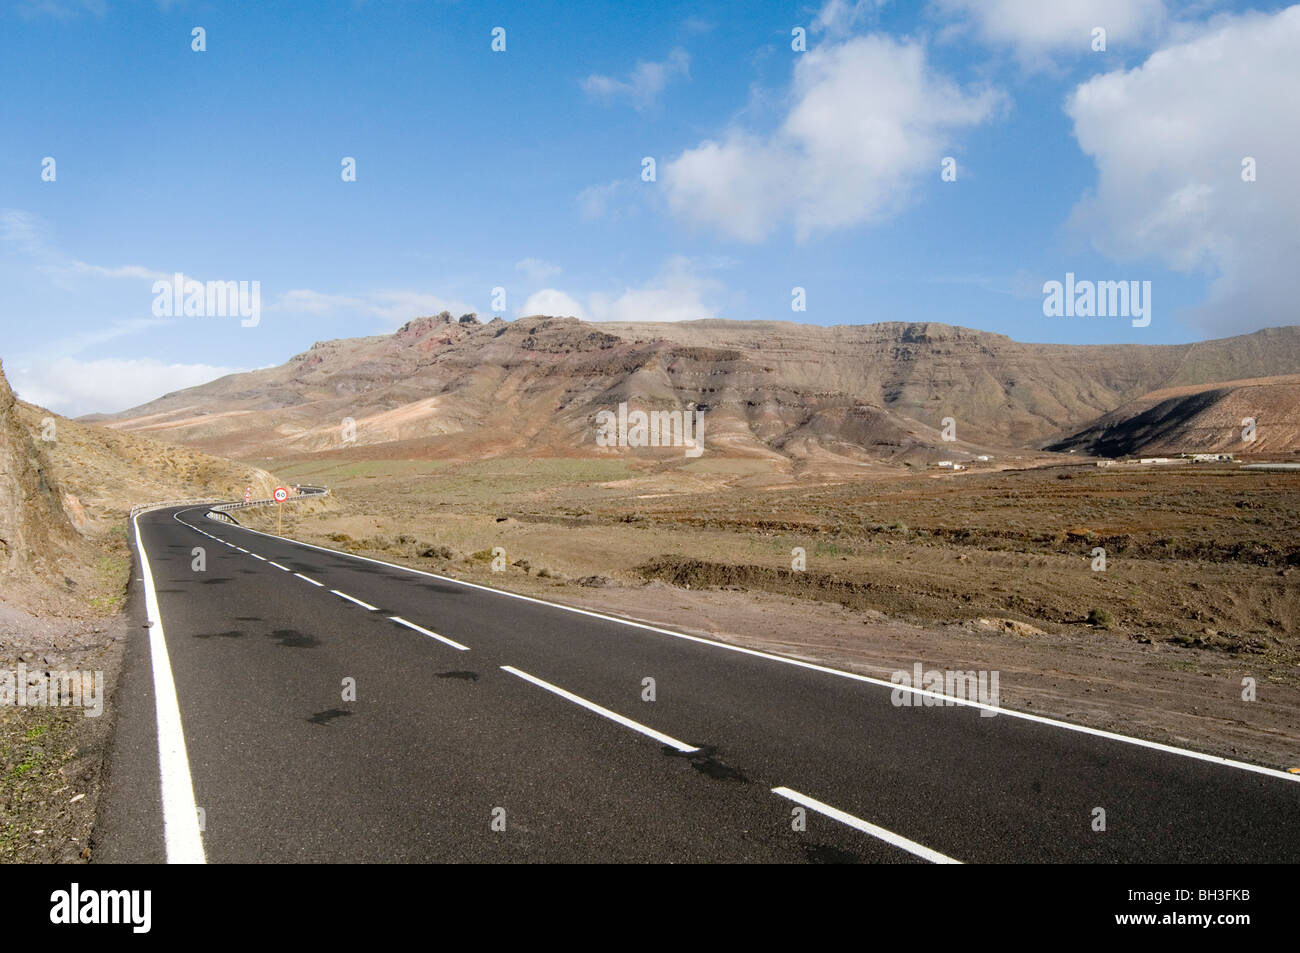 endless road roads mountain long drive drives white lines line mountains desert deserted deserts arid dry journey - Stock Image